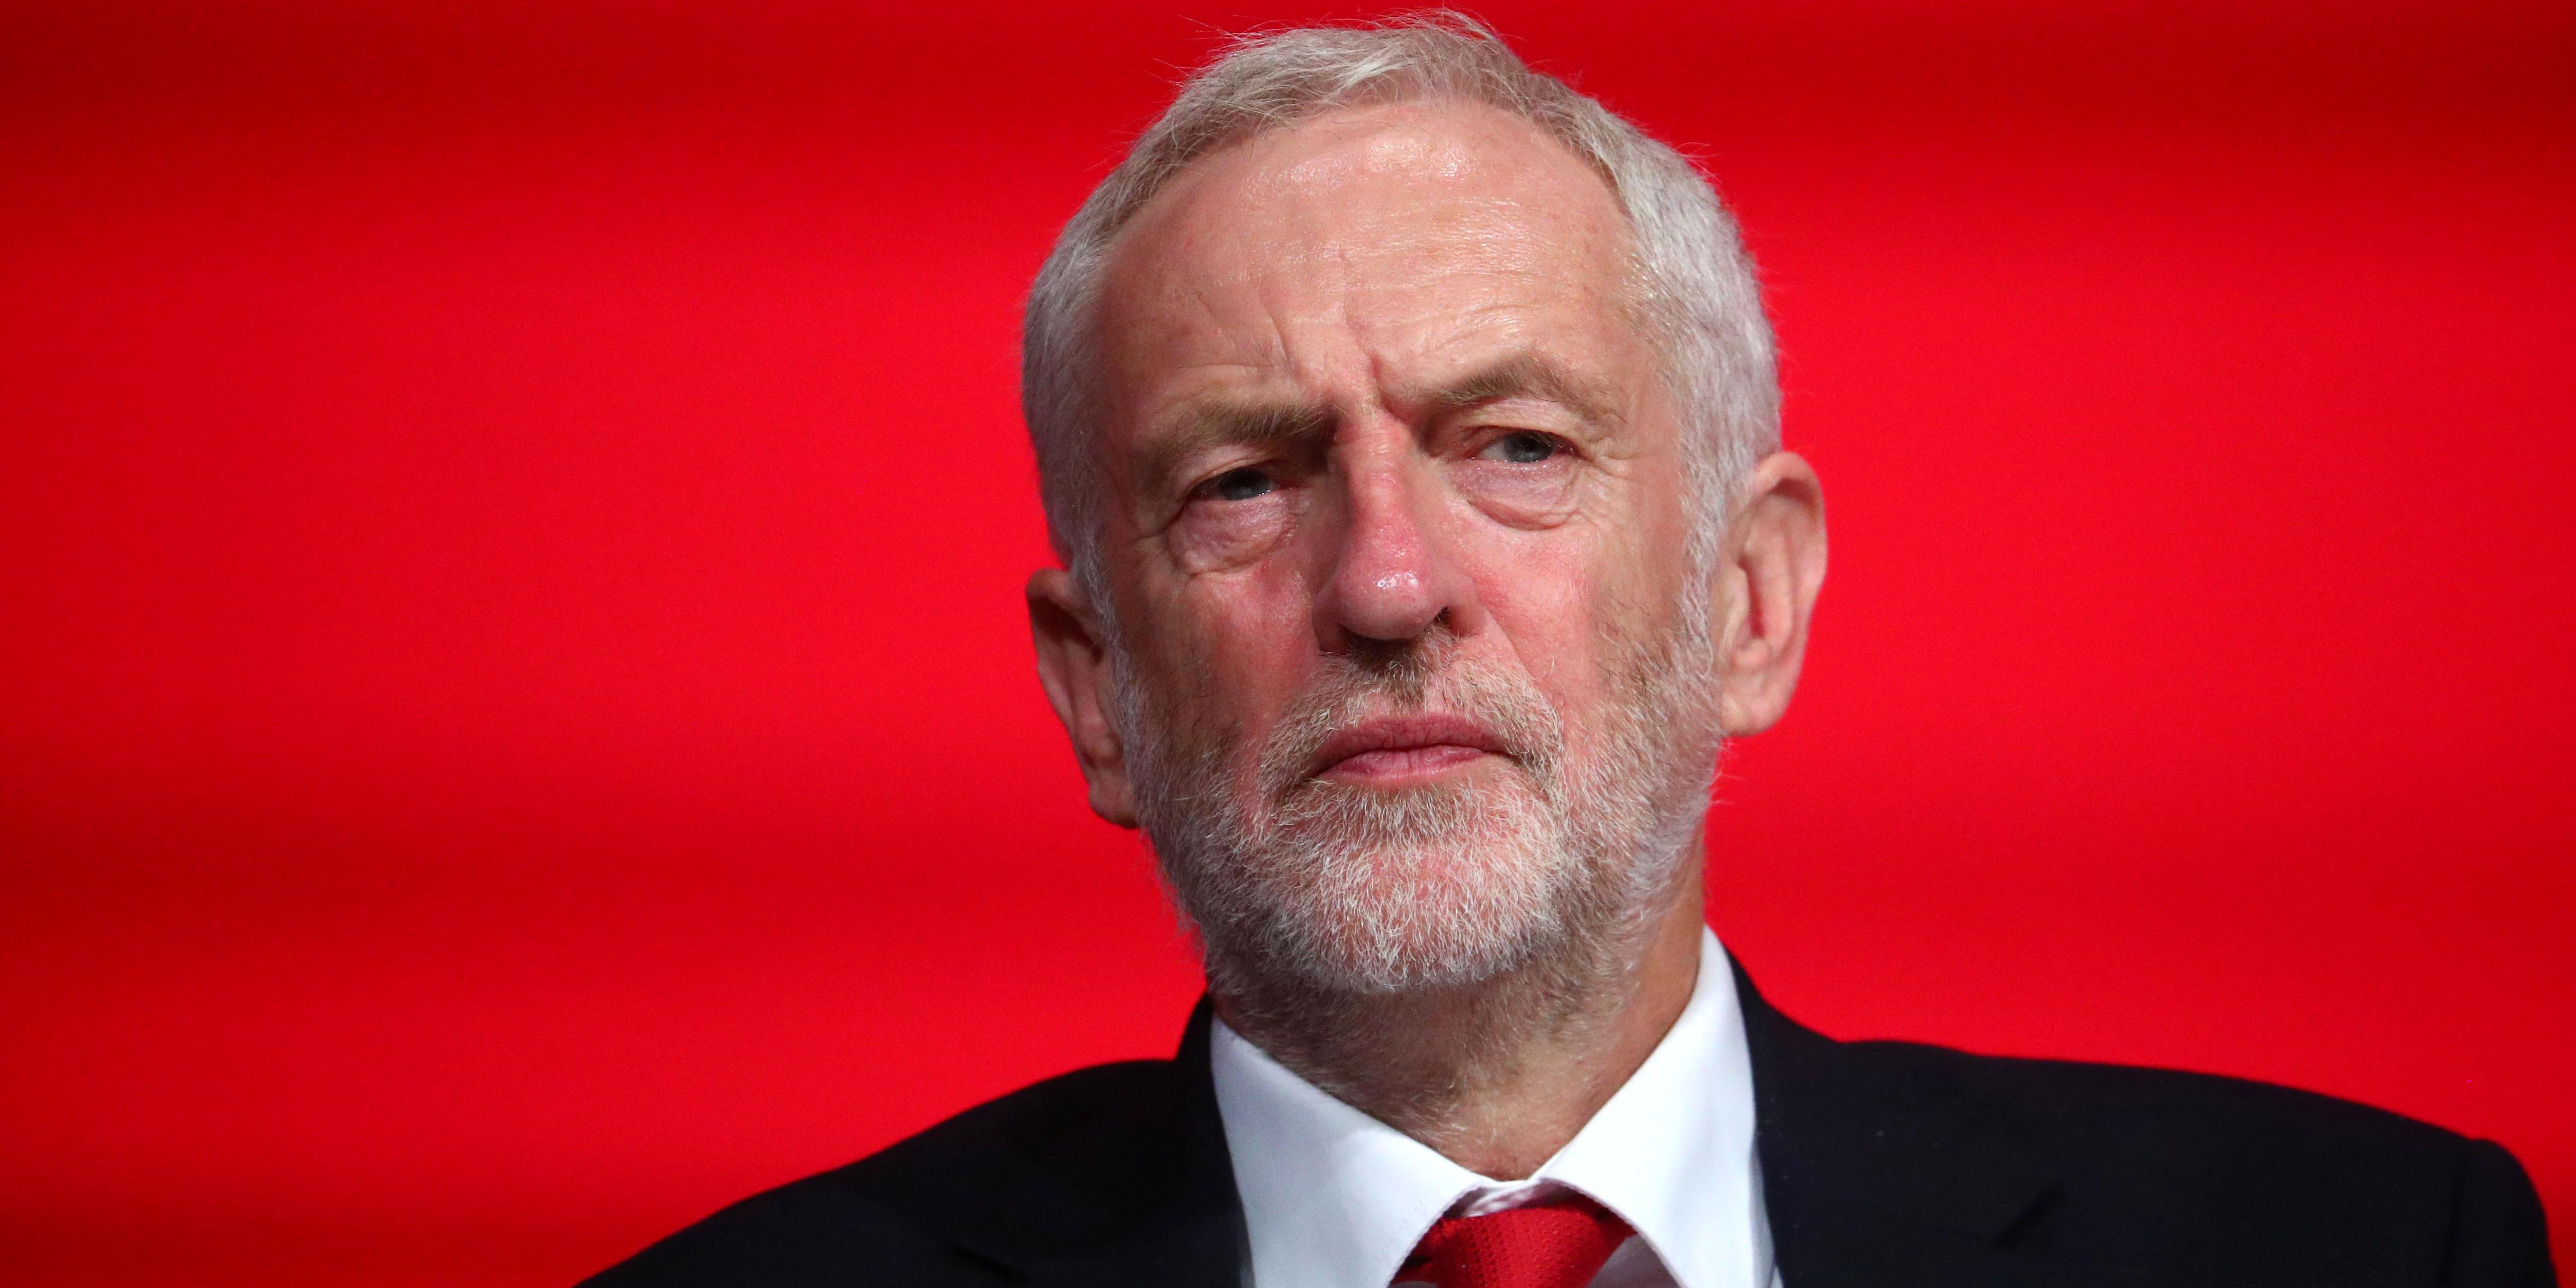 corbyn-prefere-des-elections-a-l-idee-d-un-2e-referendum